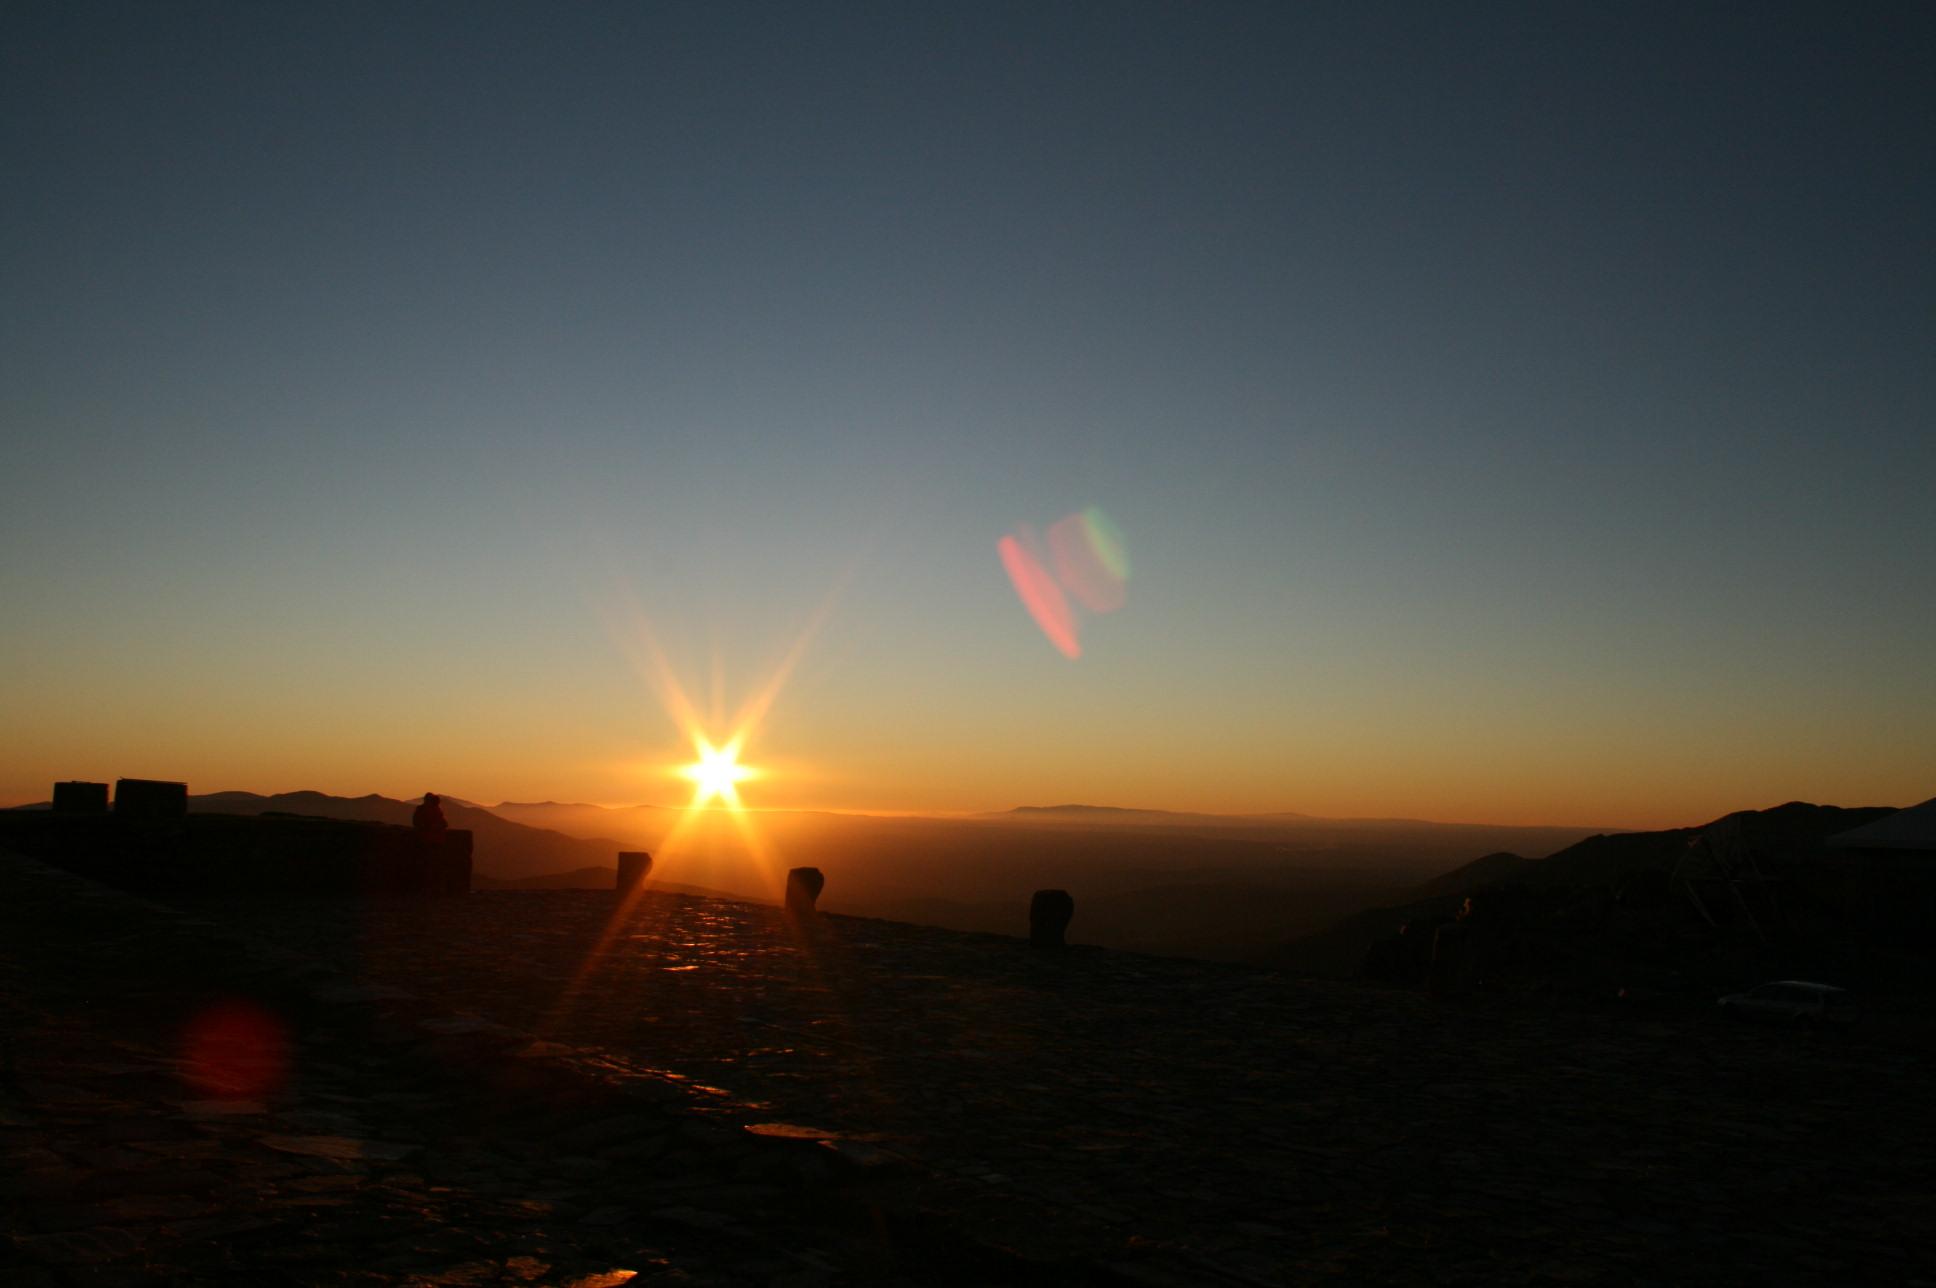 curiosity sunrise sunset times - HD1936×1288